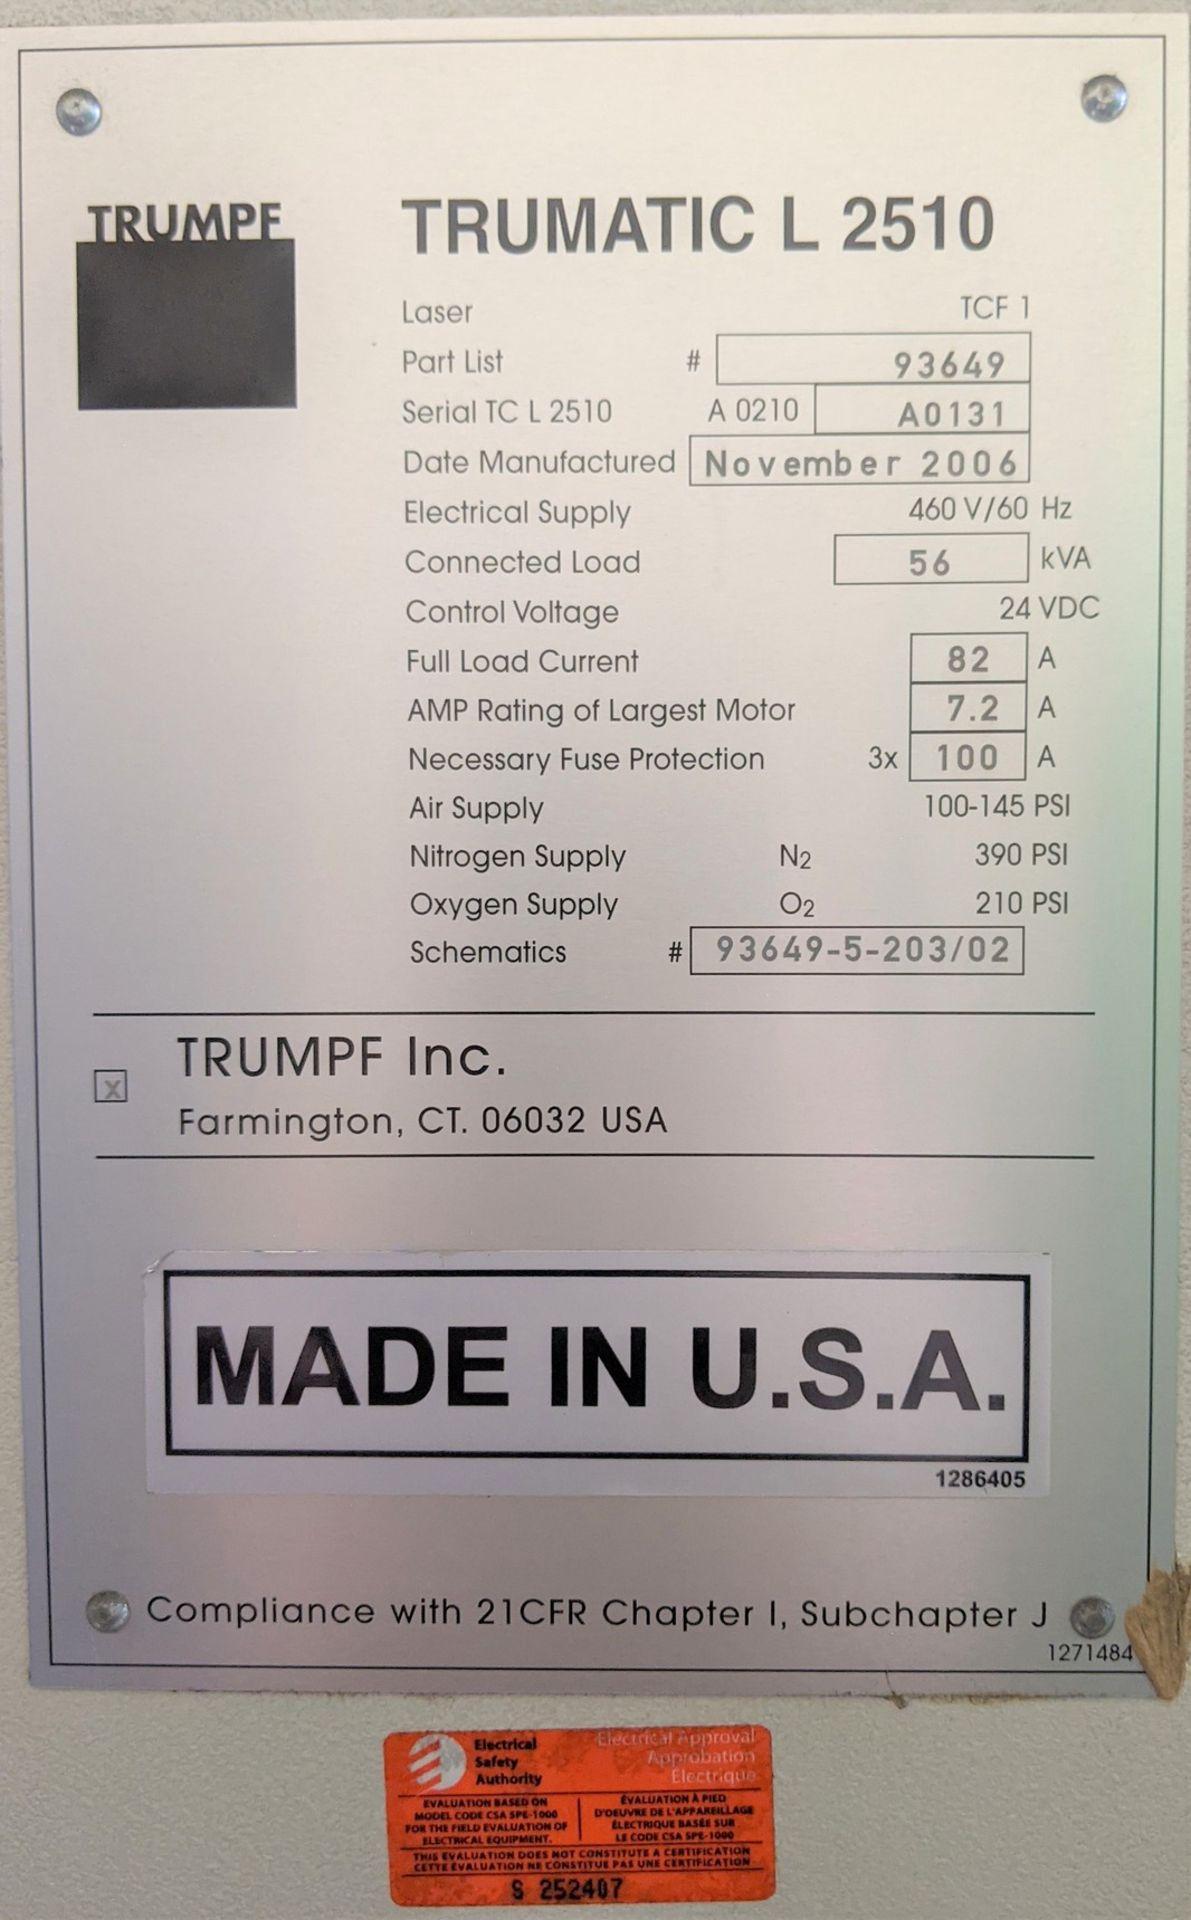 "2006 TRUMPF TRUMATIC L 2510 CNC LASER, 2,000 WATT, 4' X 10' TABLE, TRAVELS: X-120"", Y-50"", Z- - Image 21 of 32"